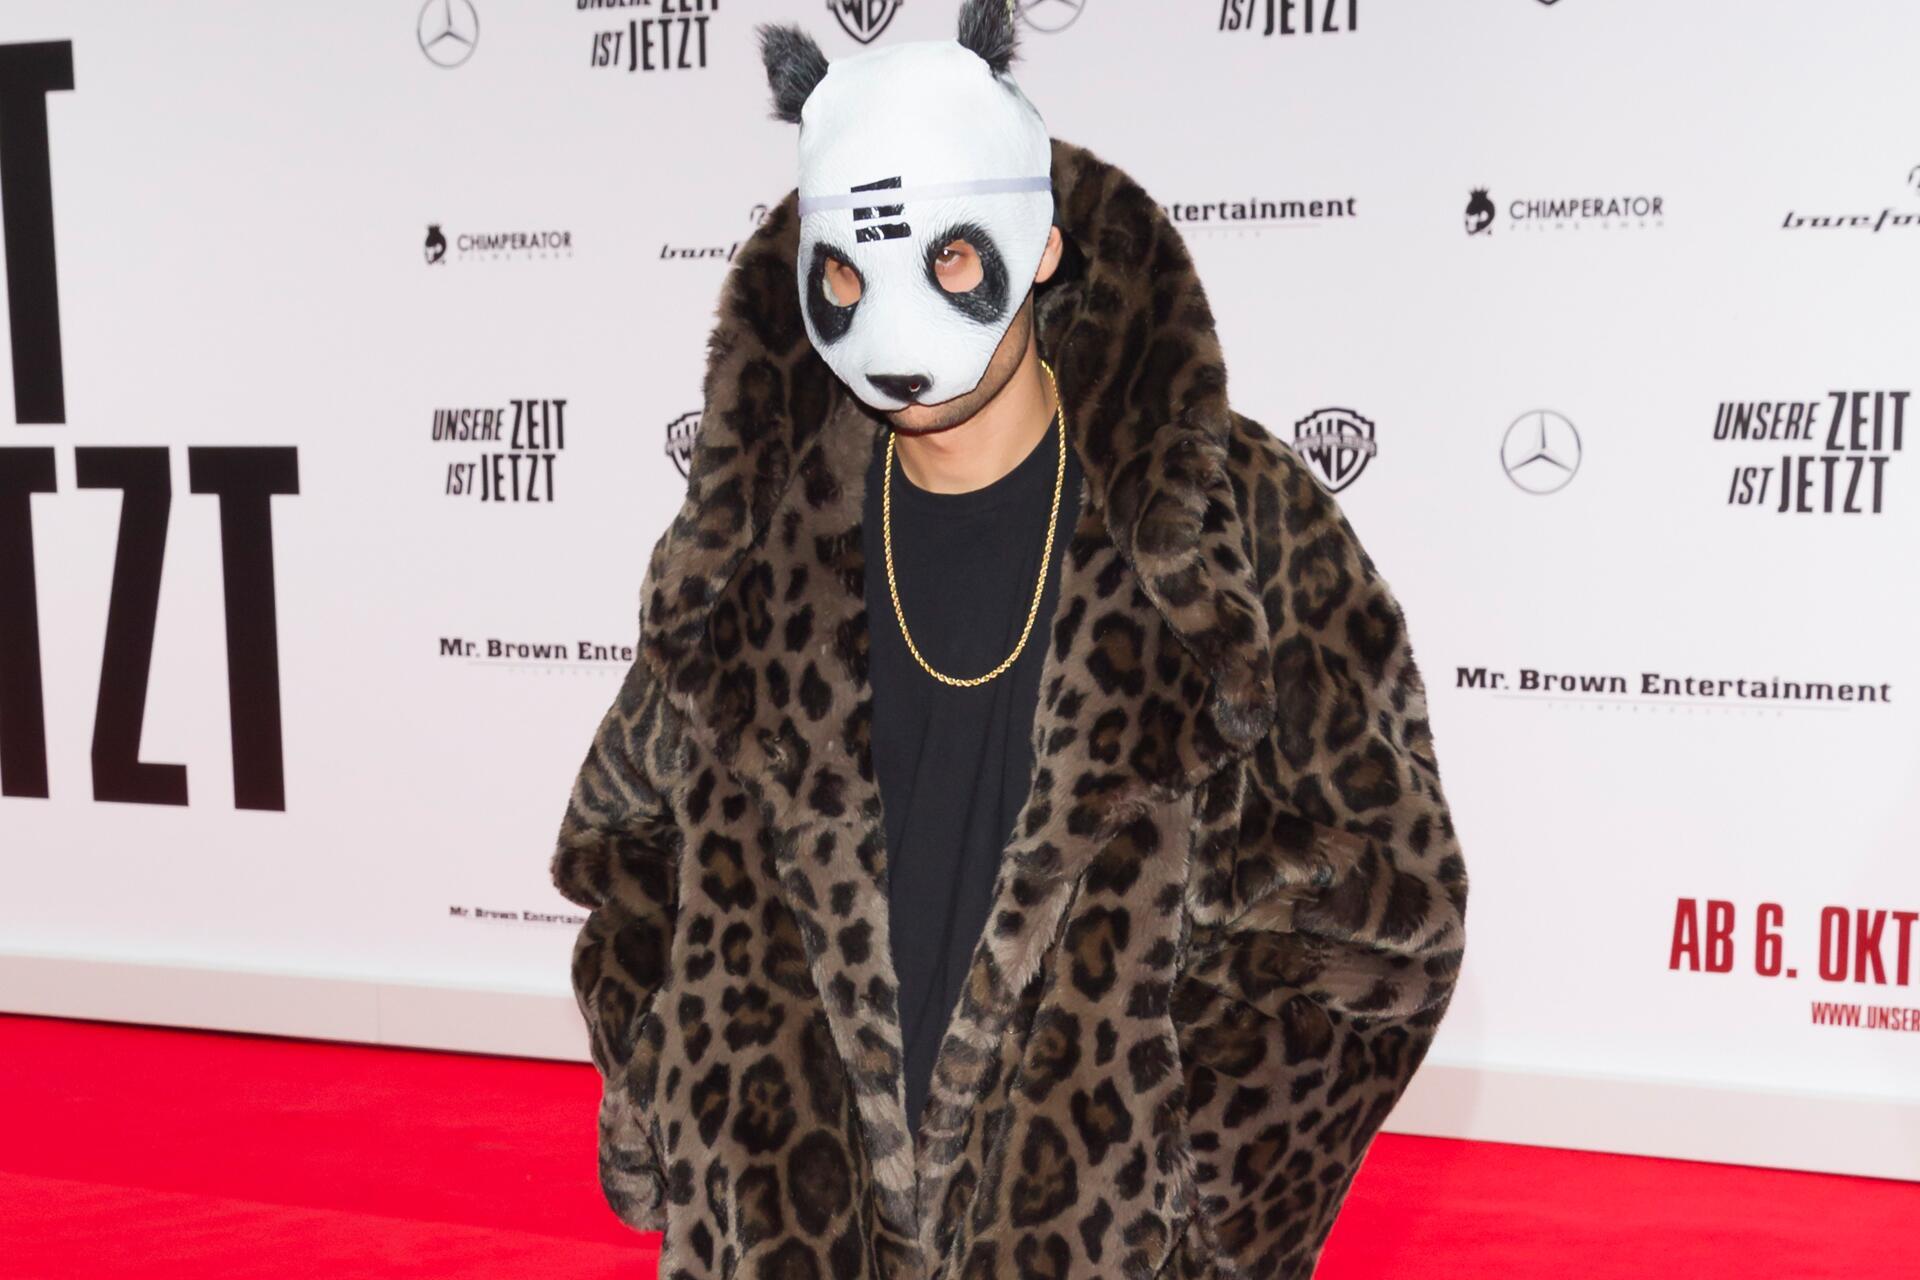 Bild zu Cro, Leoparden-Panda, Premiere